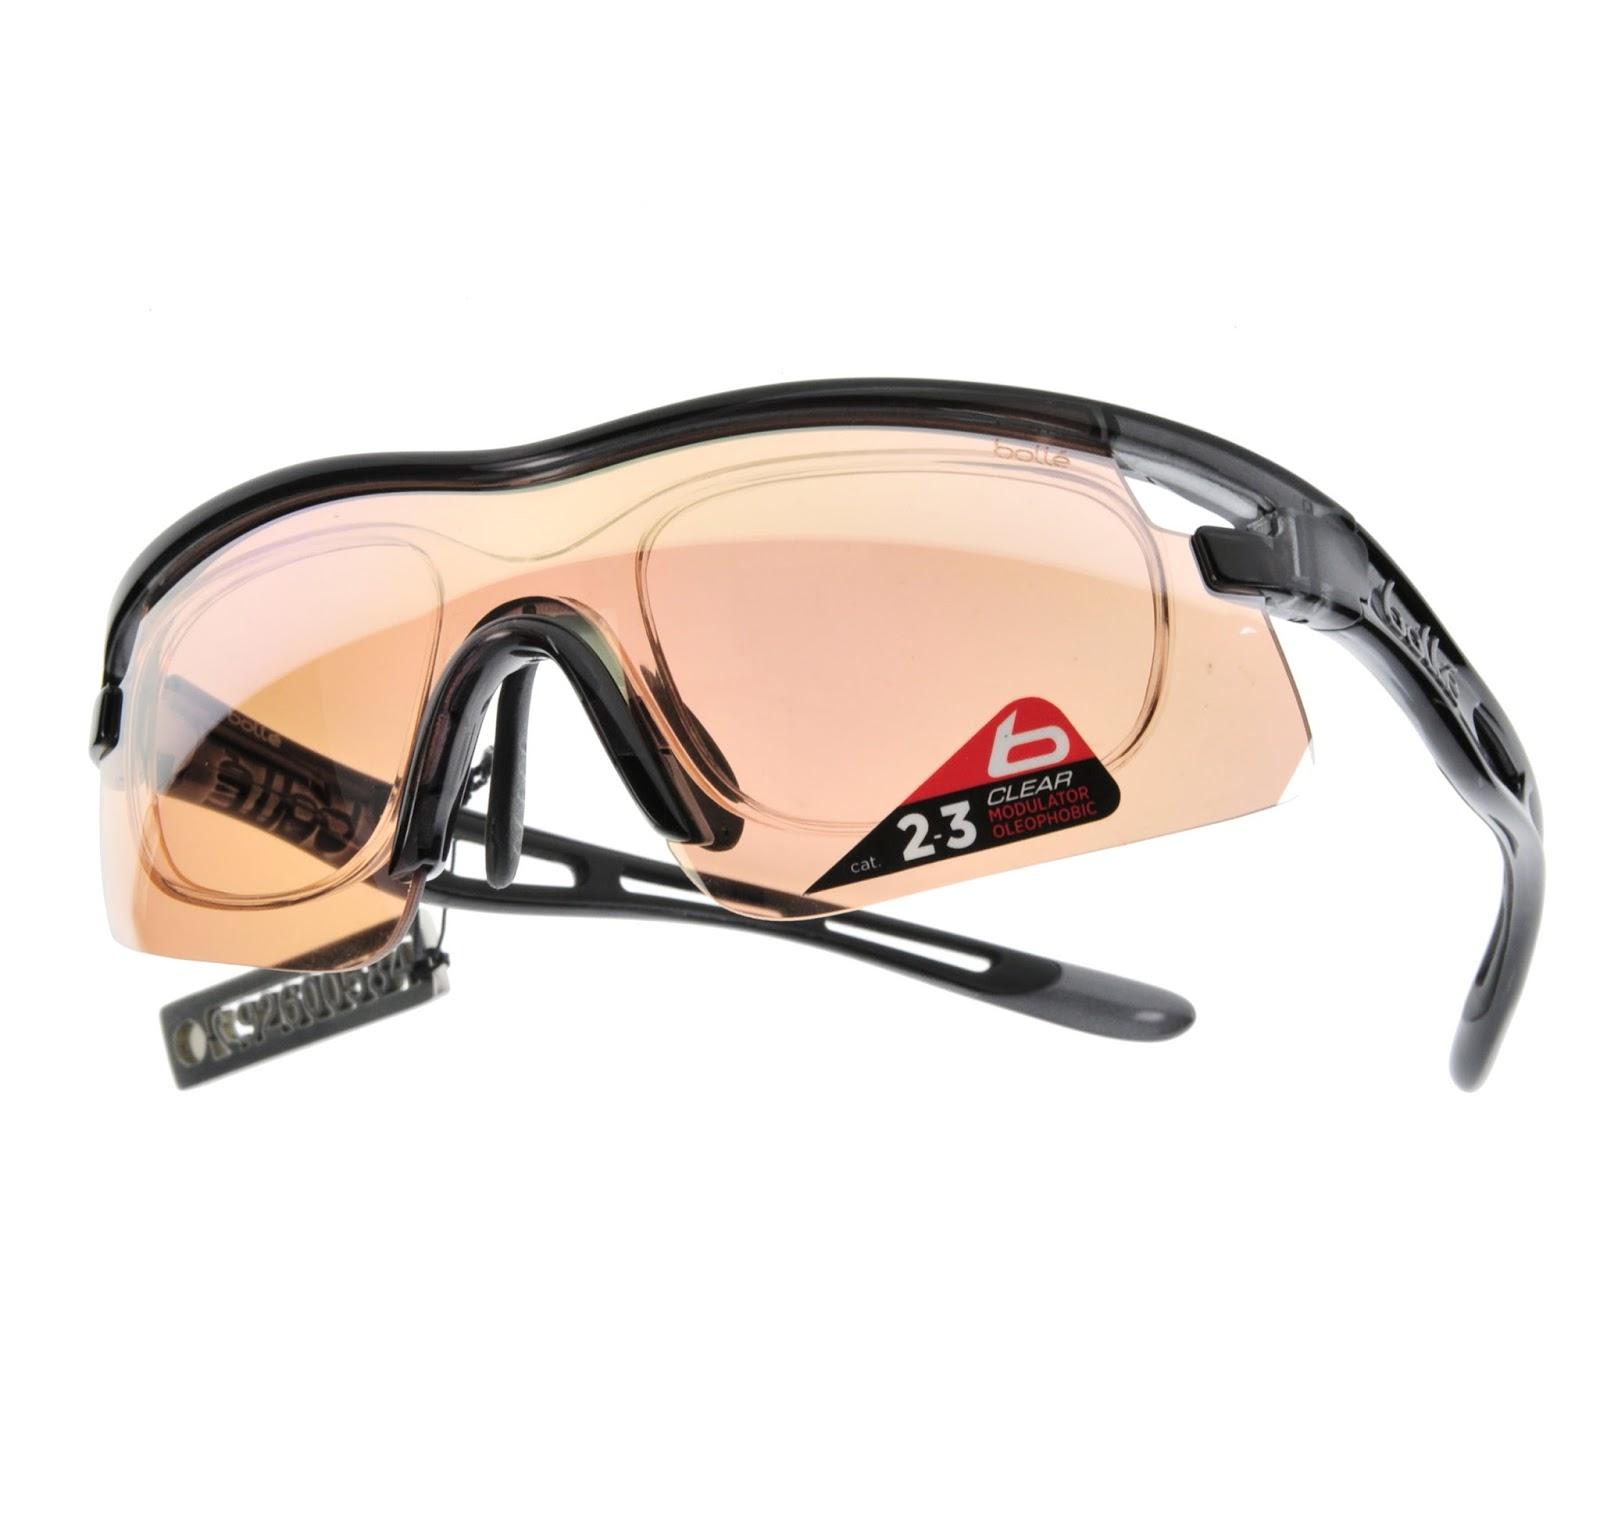 精明眼鏡公司: Bolle